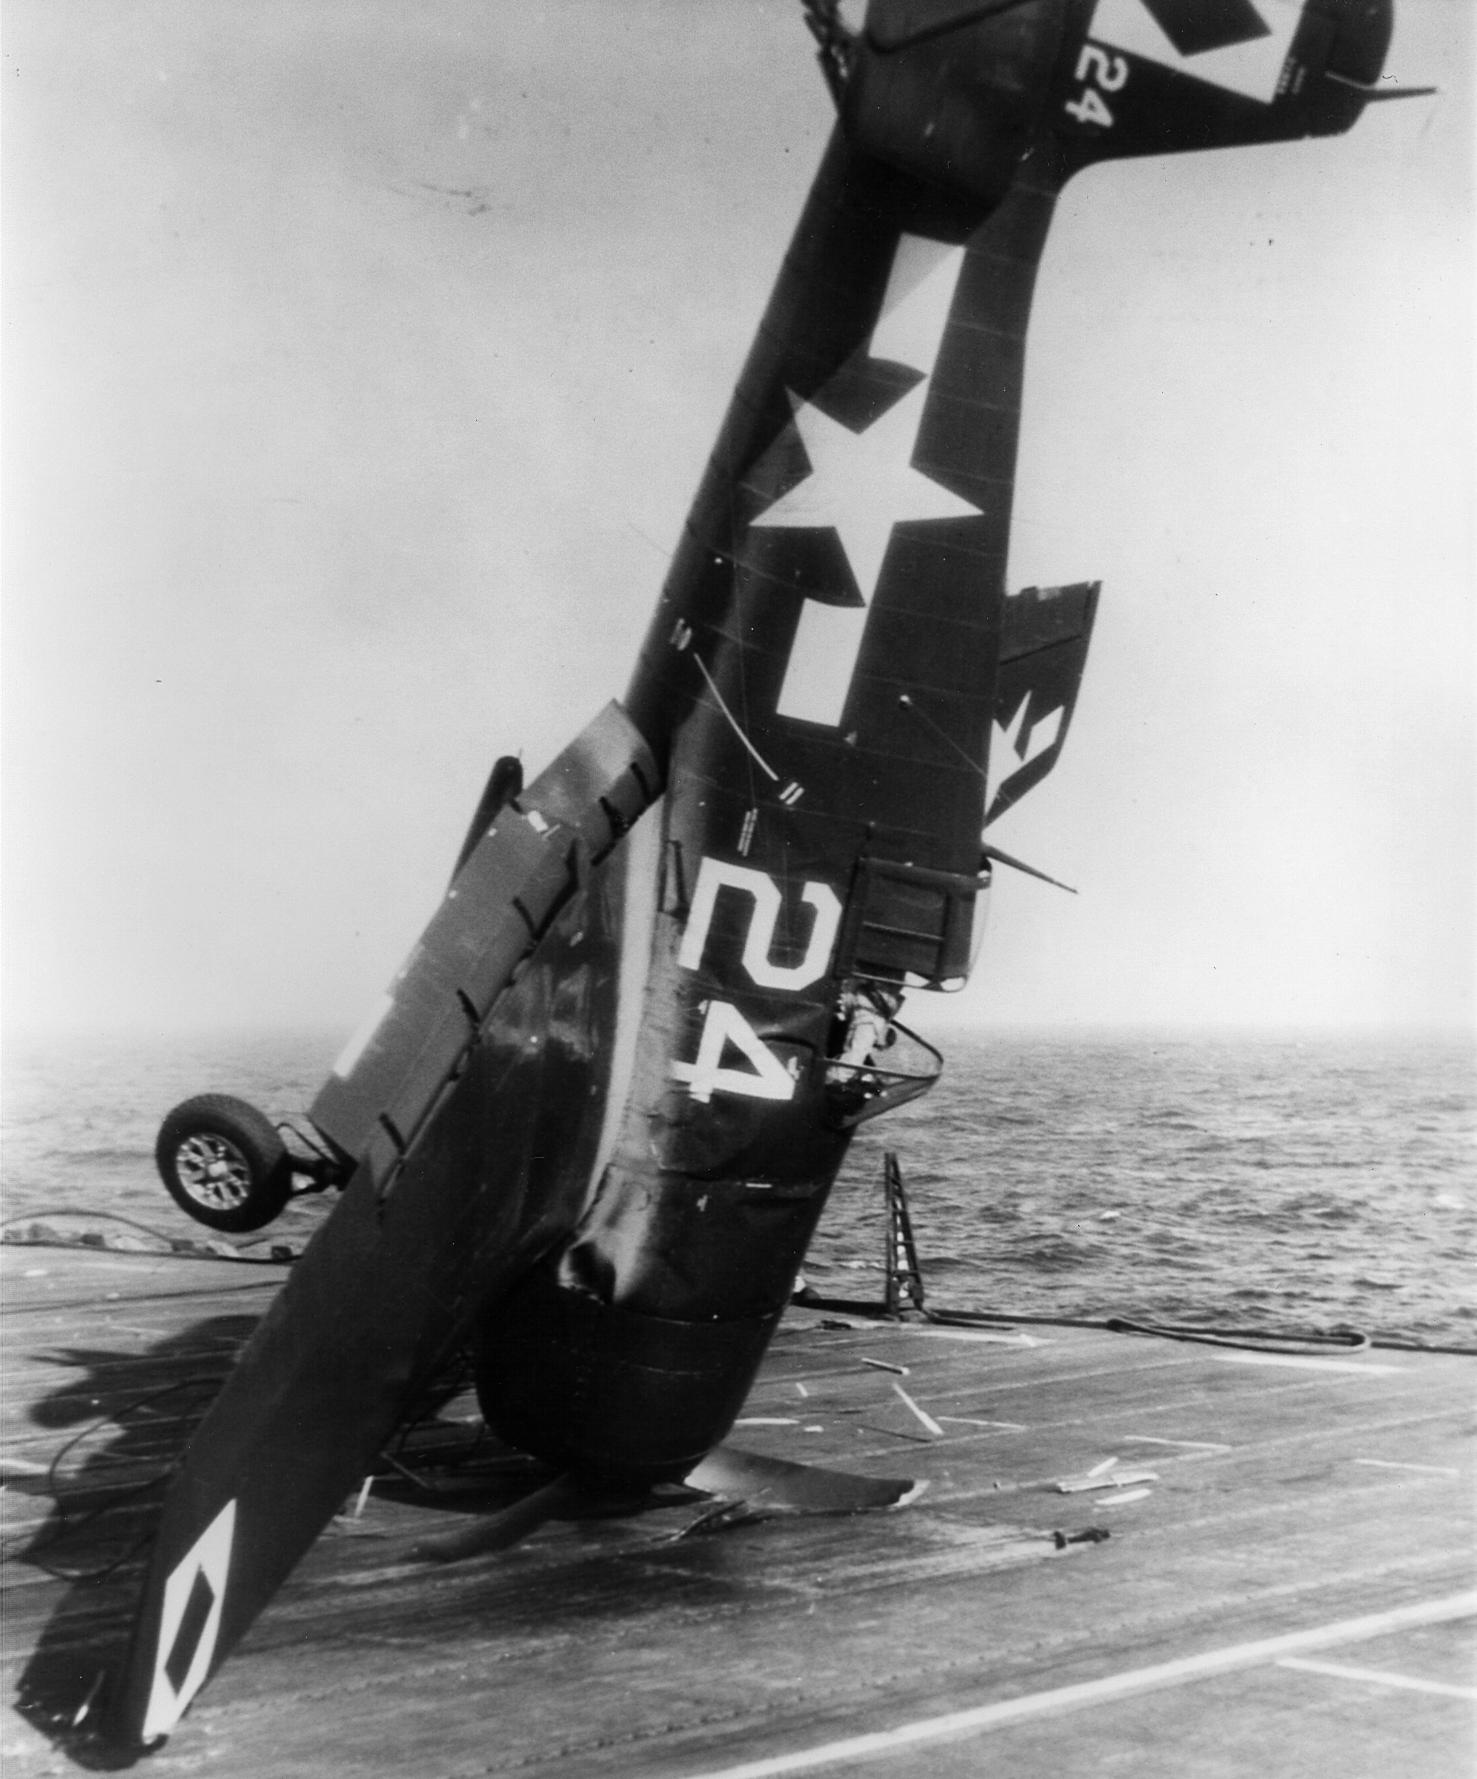 Grumman F6F 5 Hellcat VF 23 White 24 landing mishap CVL 27 USS Langley 1945 03